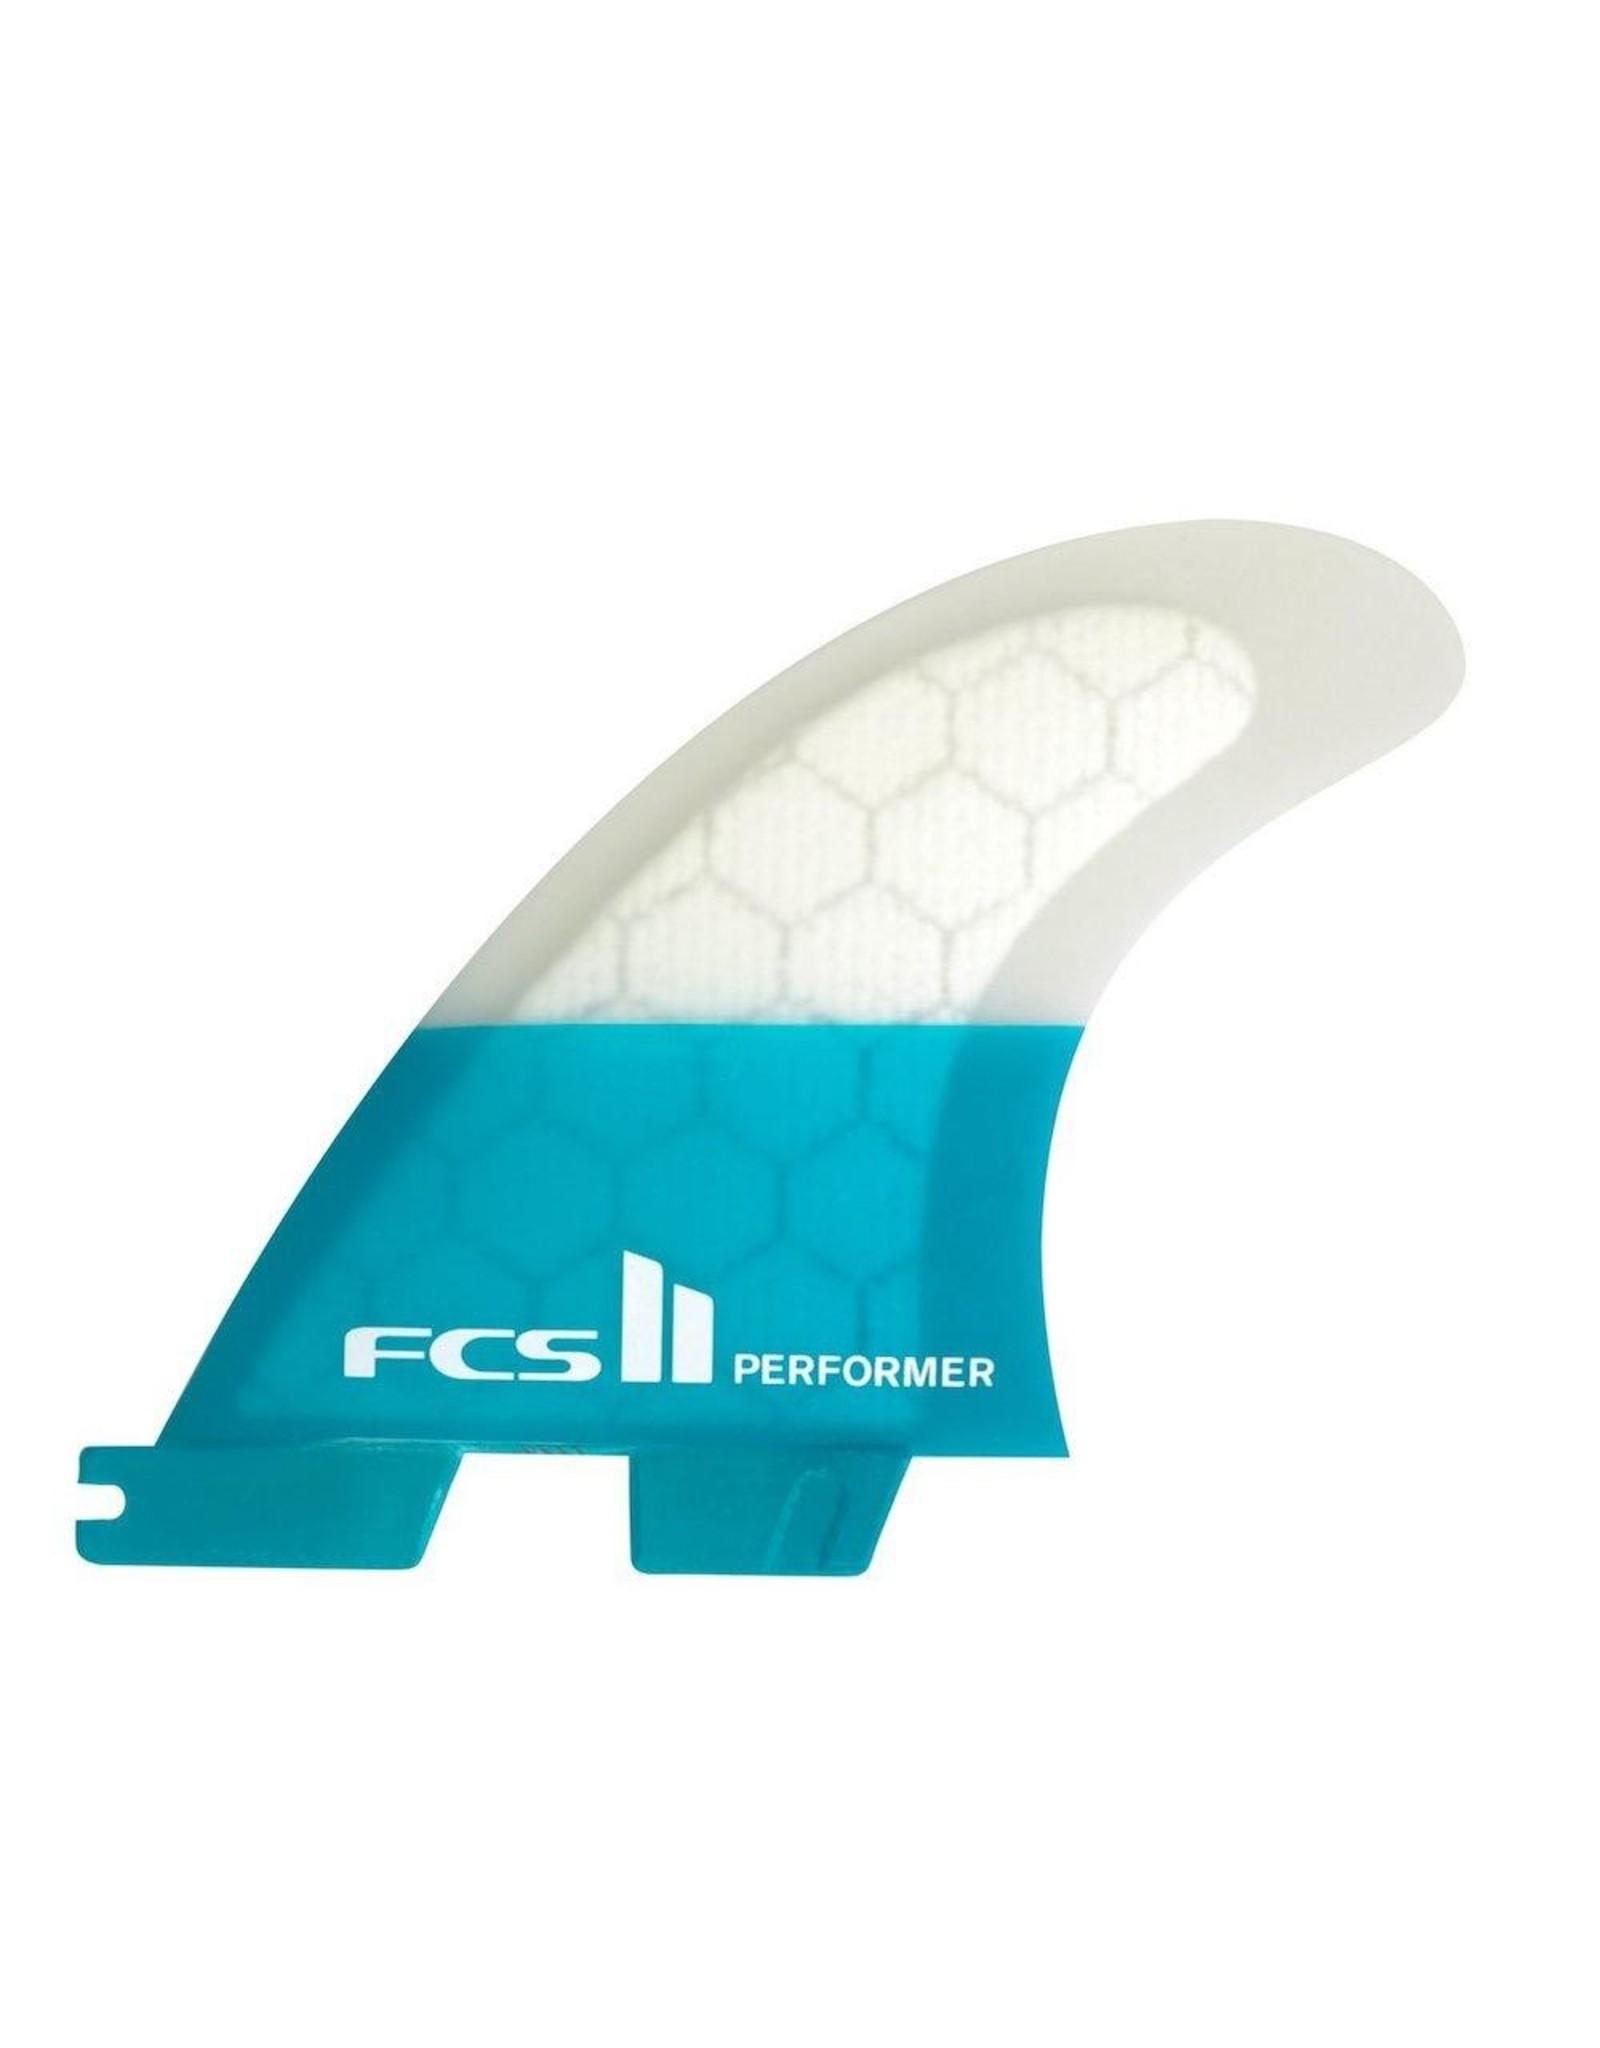 FCS FCS2 - 1Fin - Performer PC Teal Right Fin  - Teal - Medium (65-80kg)